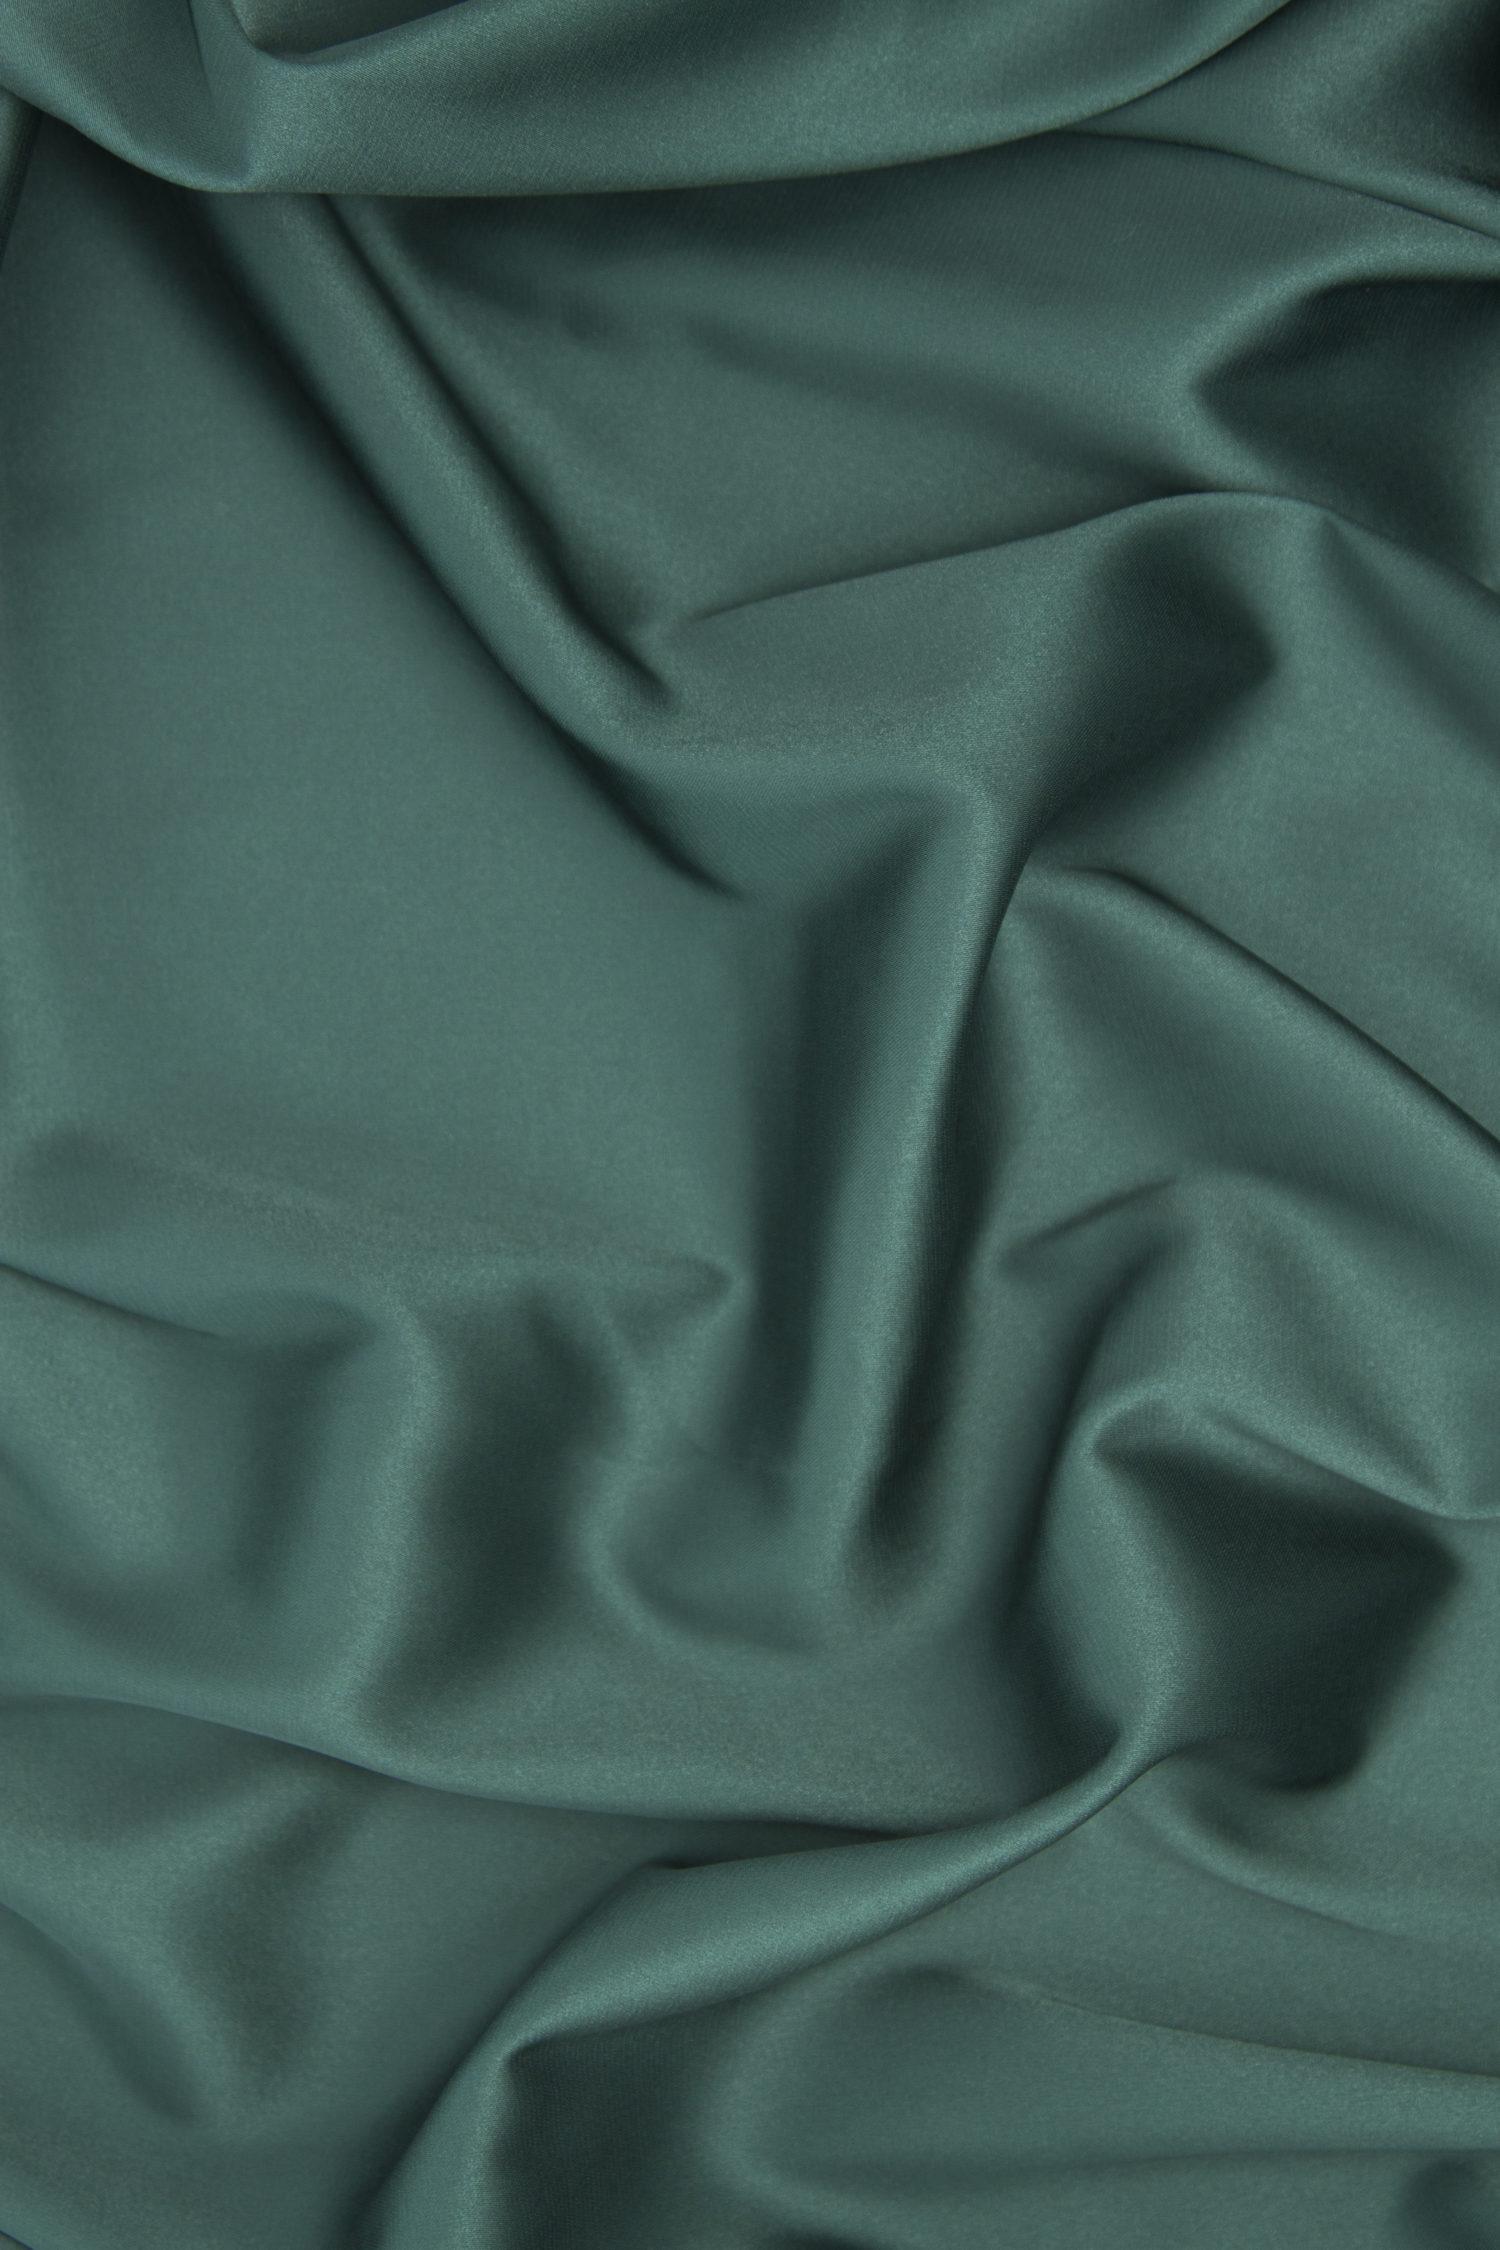 Шёлк армани тёмно-зелёный матовый